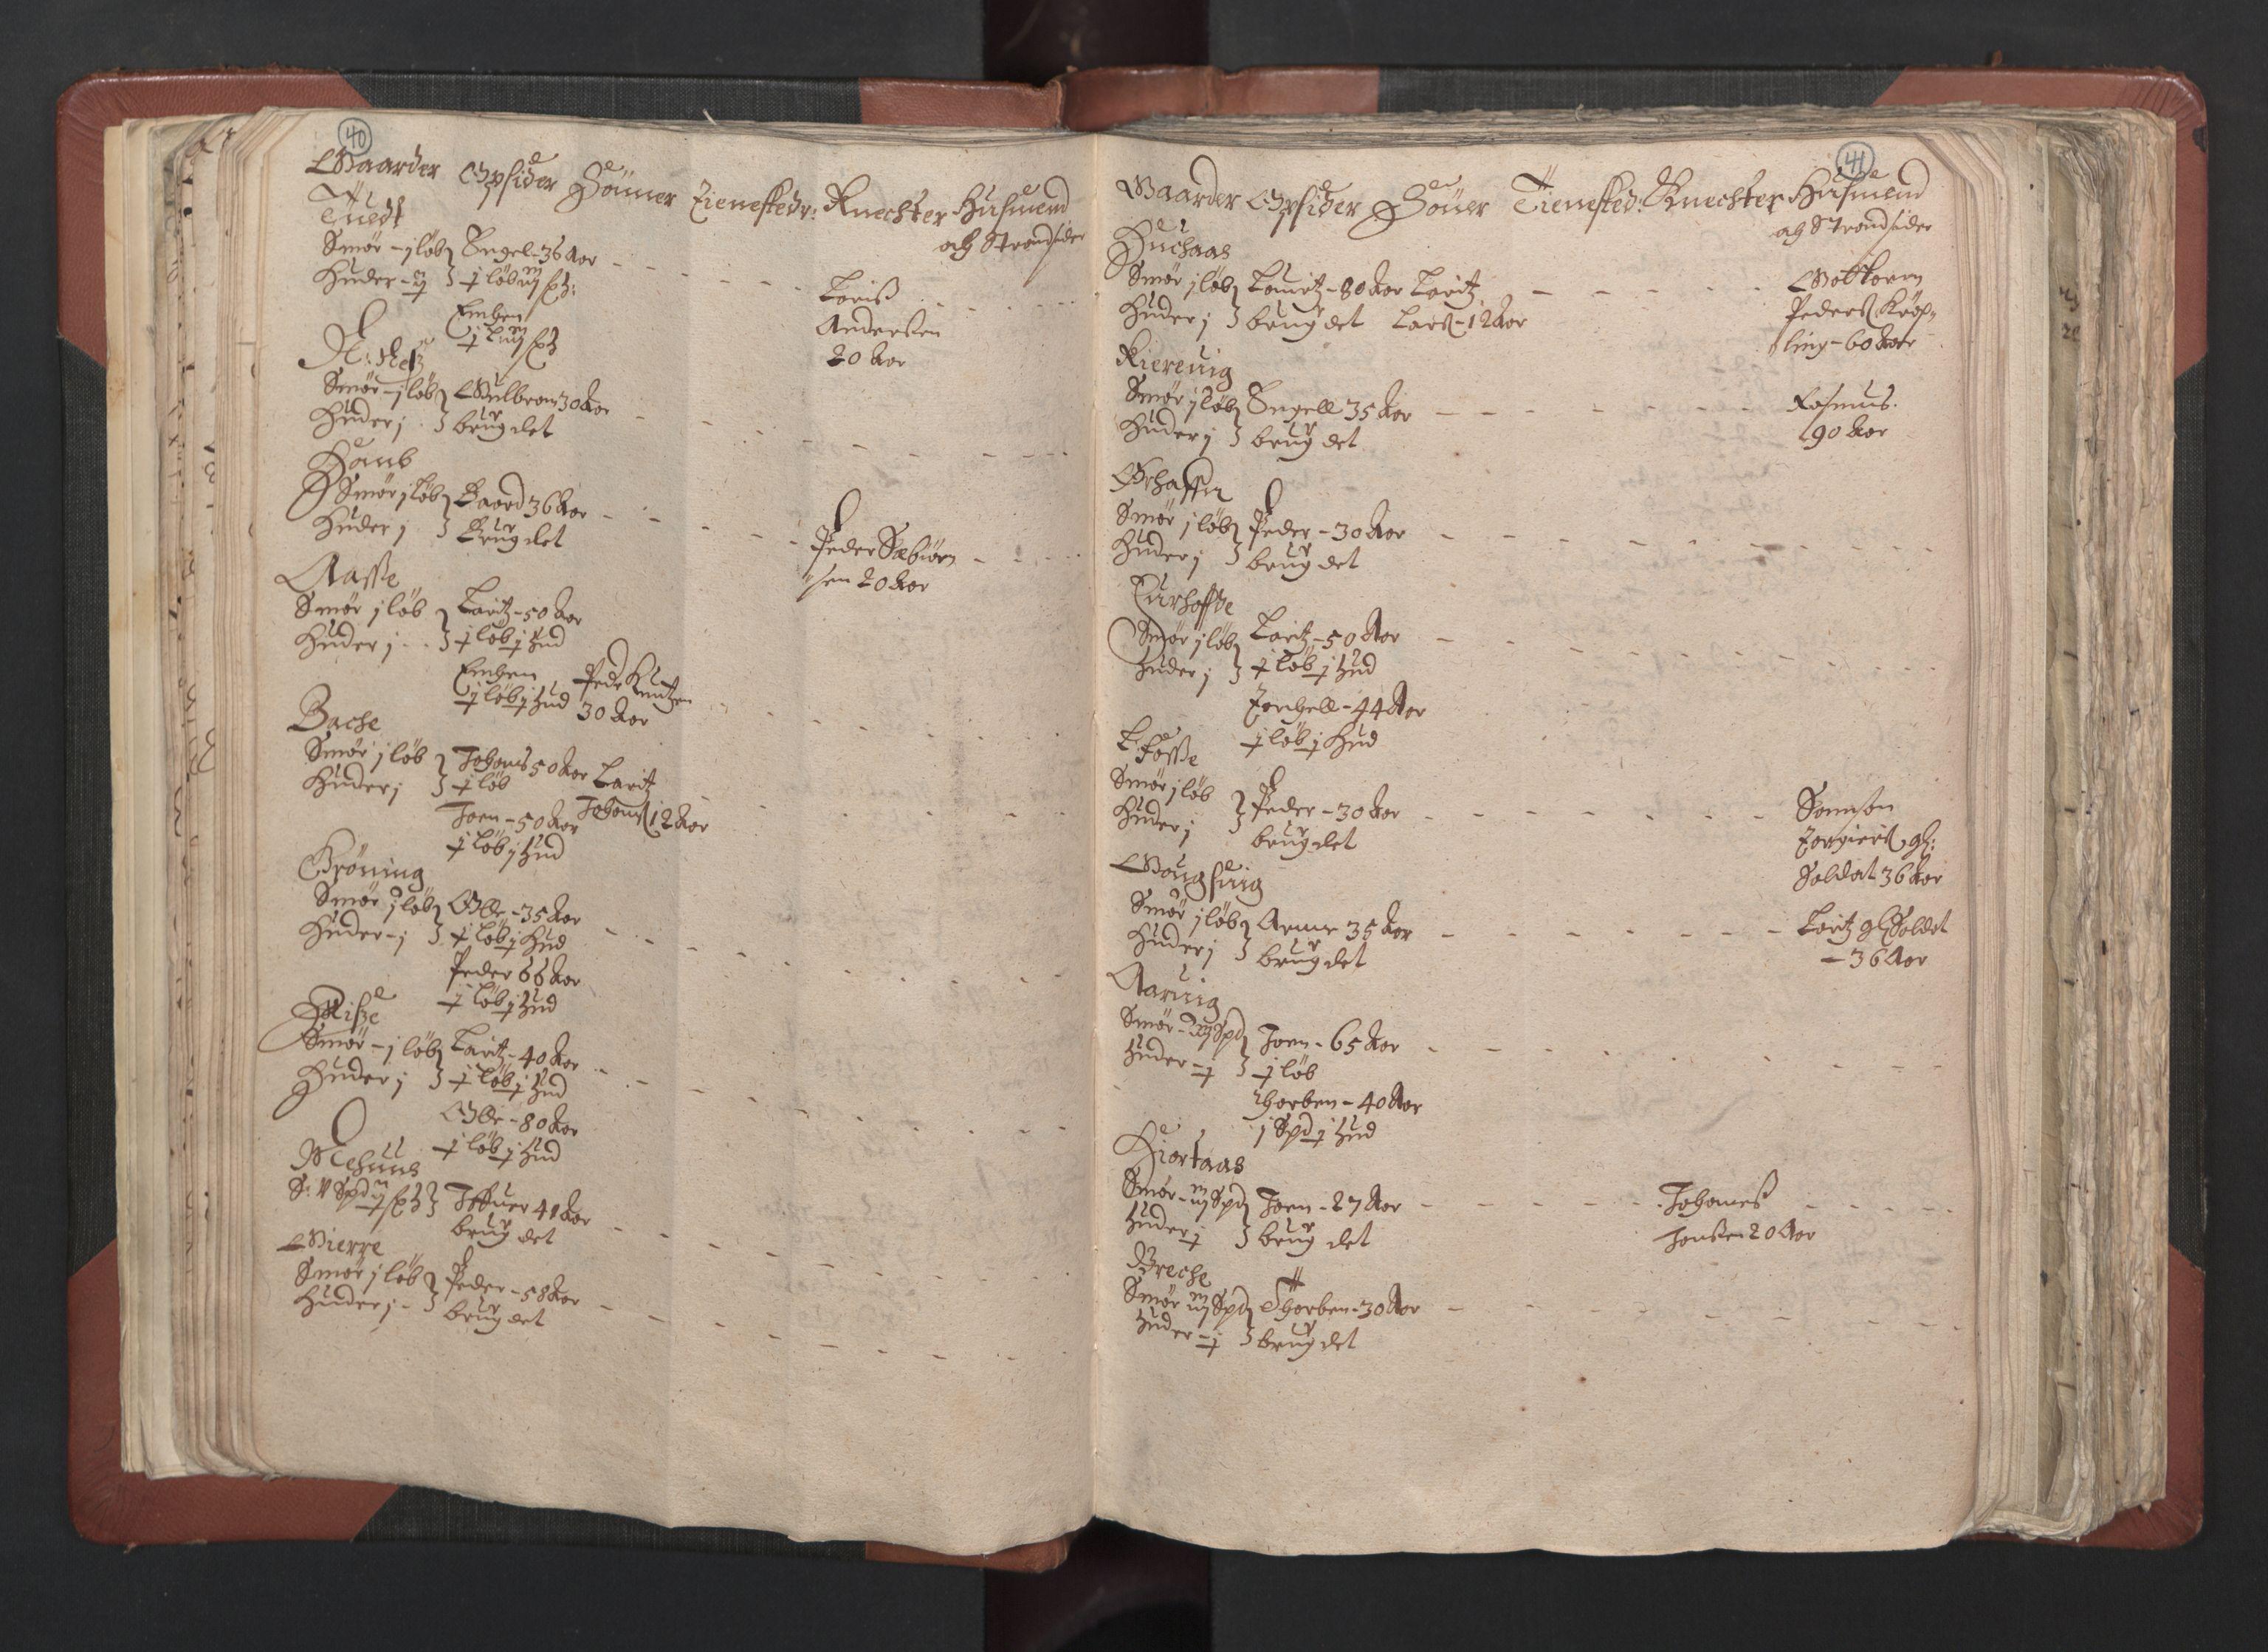 RA, Fogdenes og sorenskrivernes manntall 1664-1666, nr. 13: Nordhordland fogderi og Sunnhordland fogderi, 1665, s. 40-41